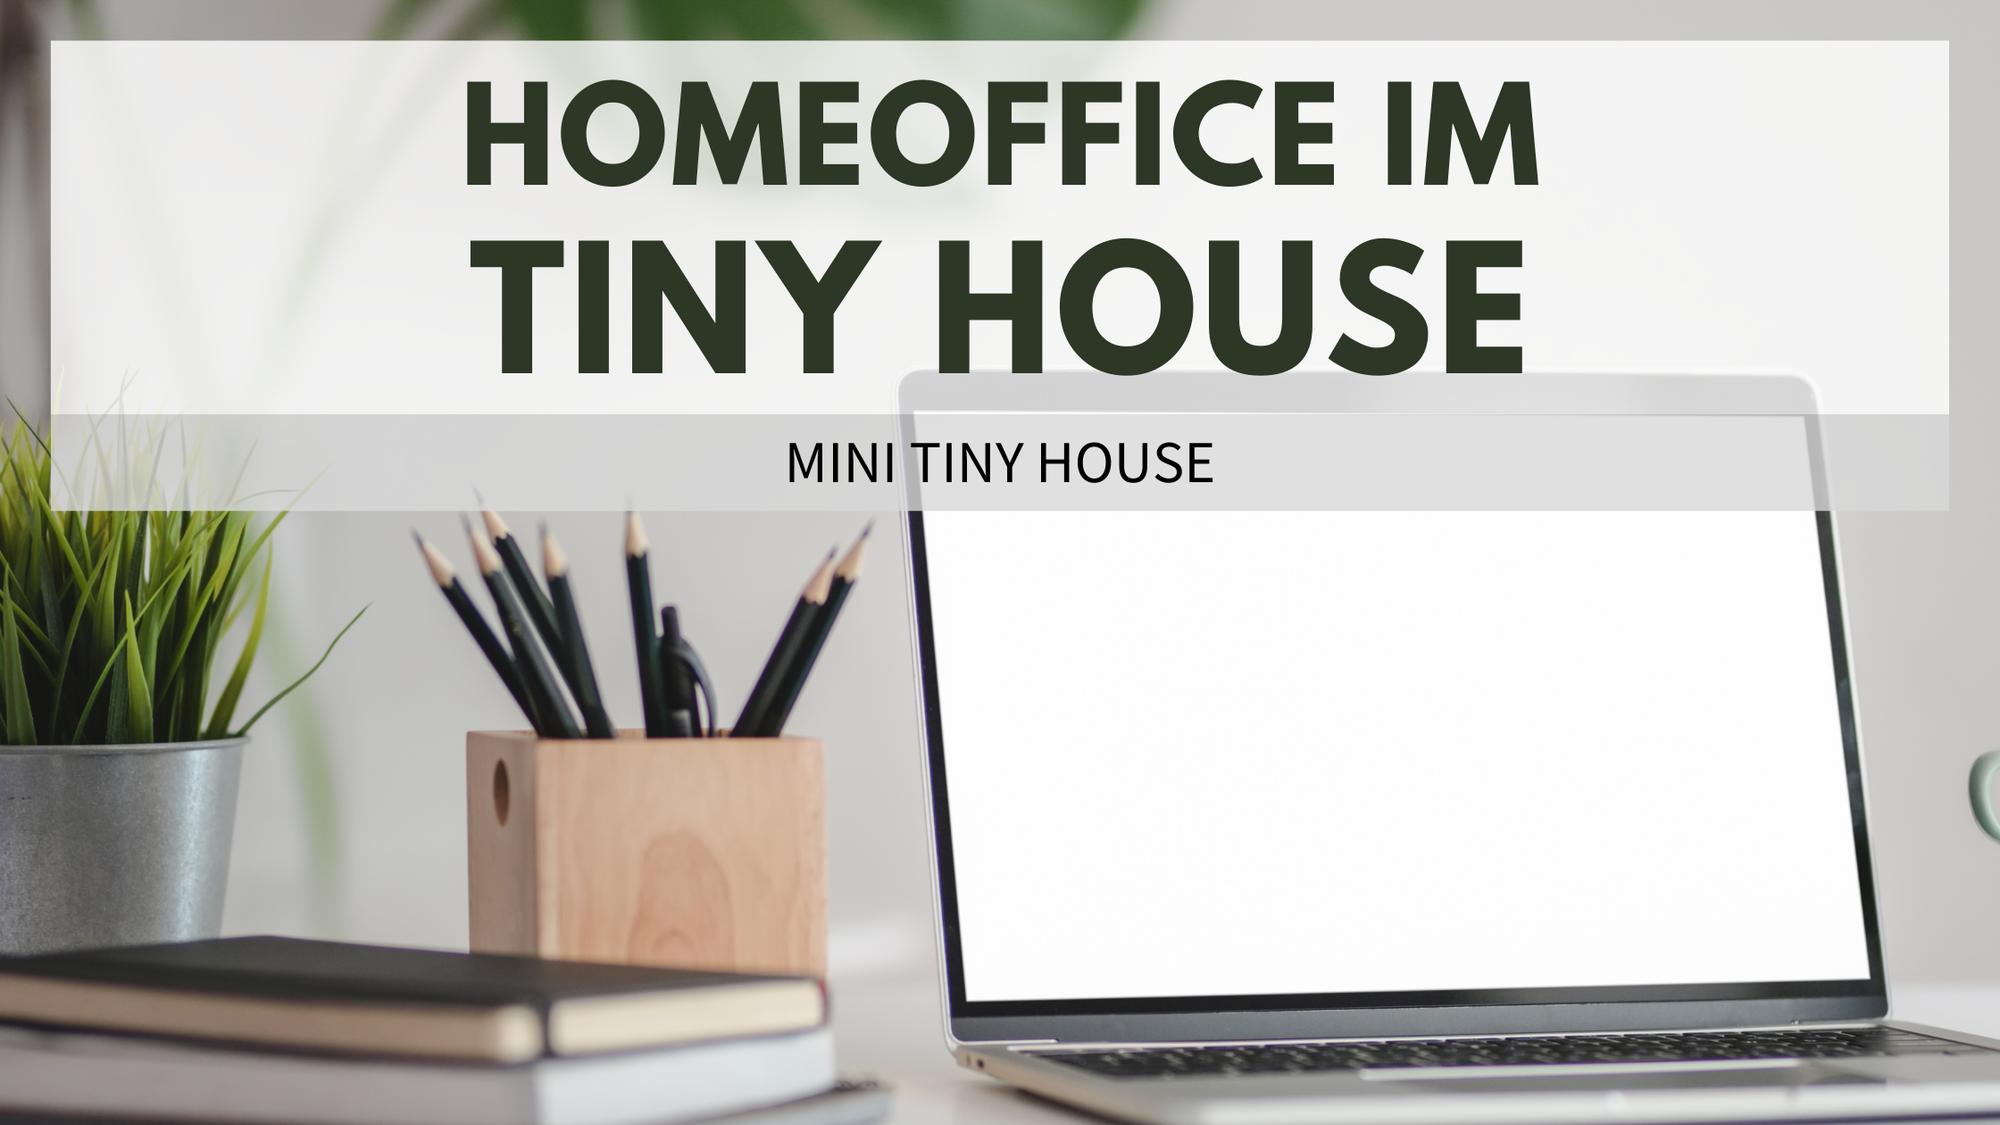 Ein Homeoffice im Tiny House